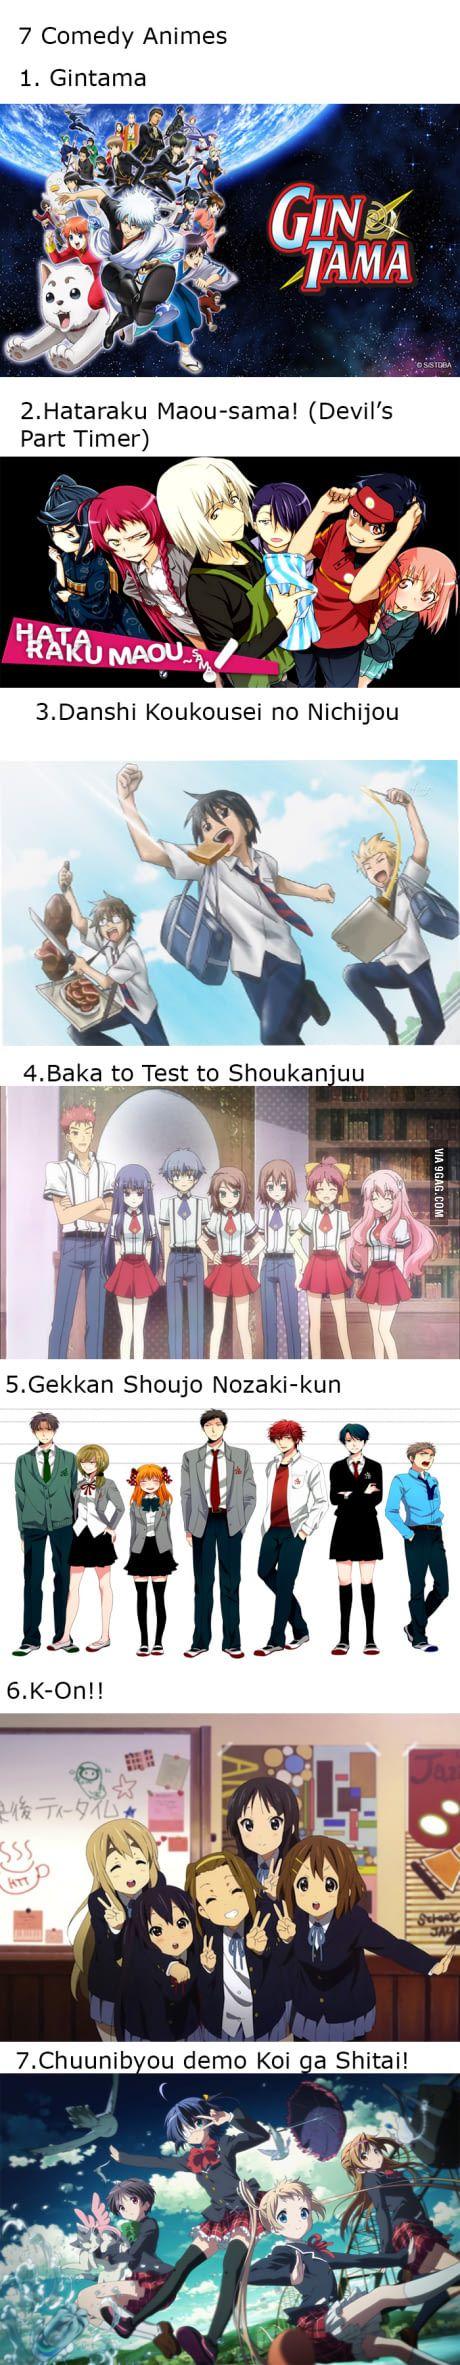 7 Comedy Animes